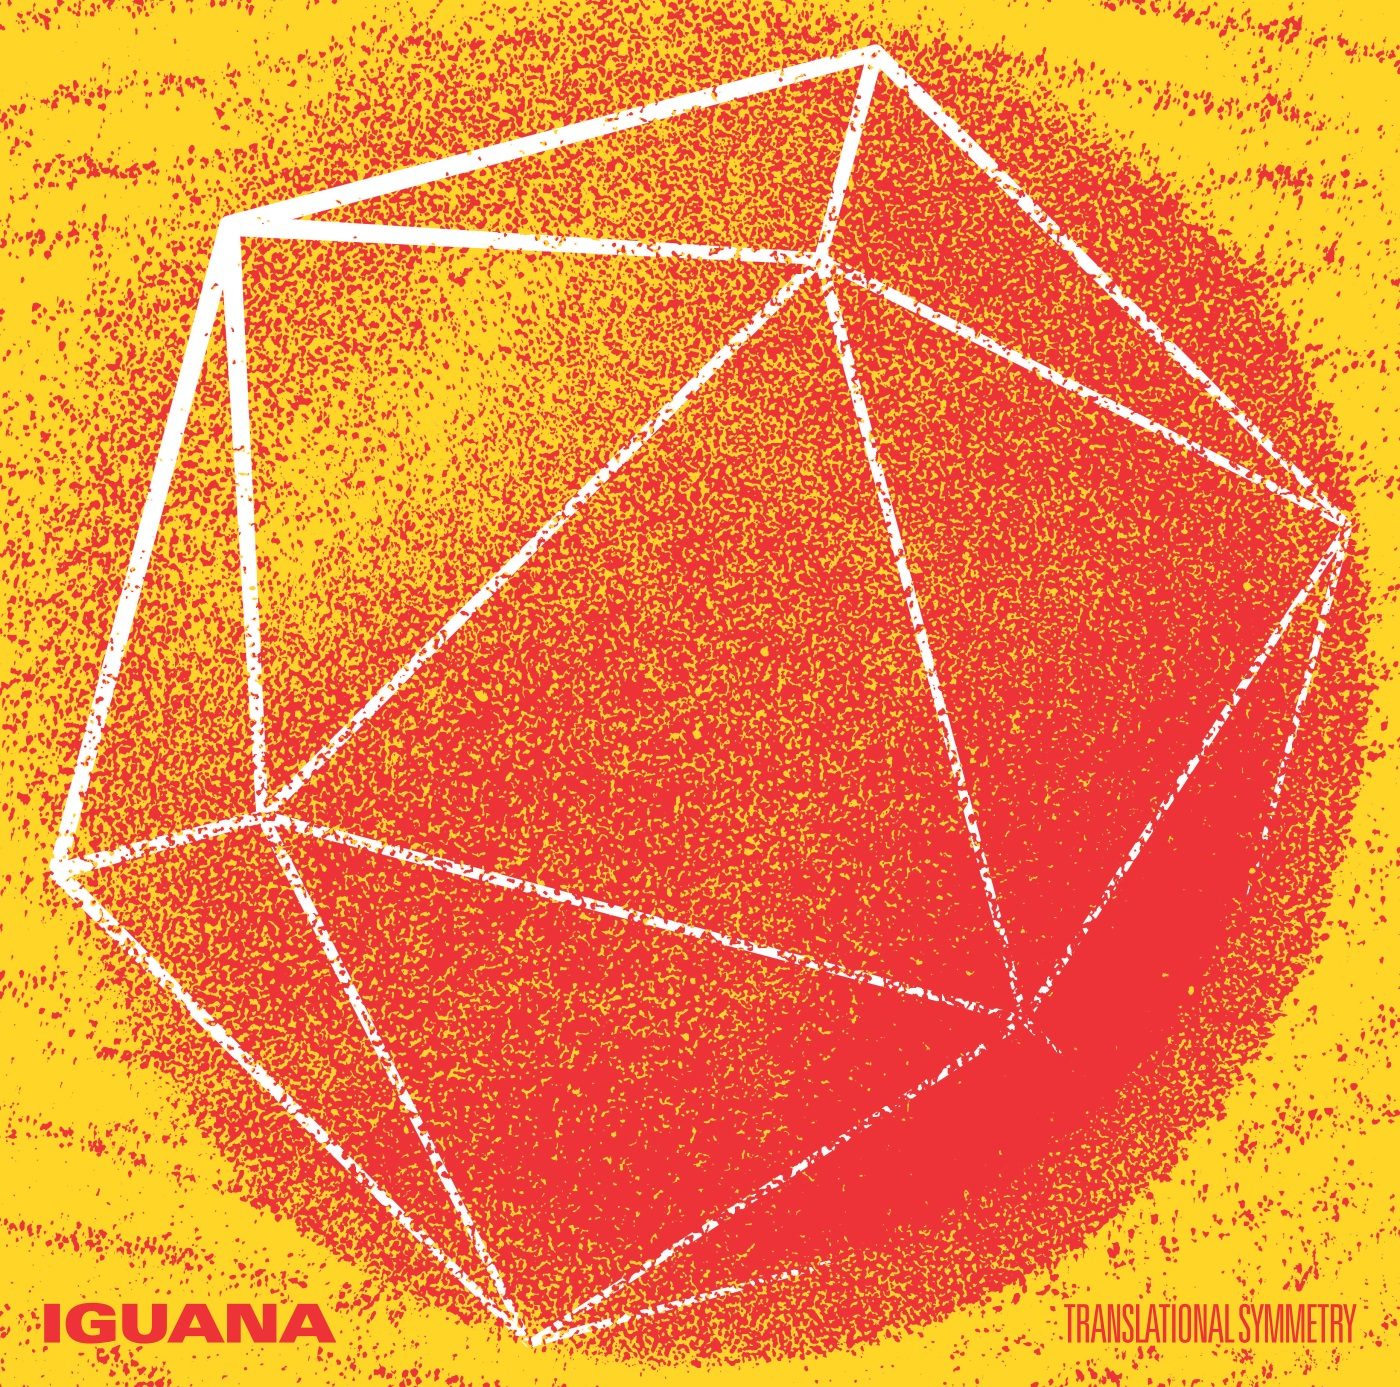 Iguana Translational Symmetry